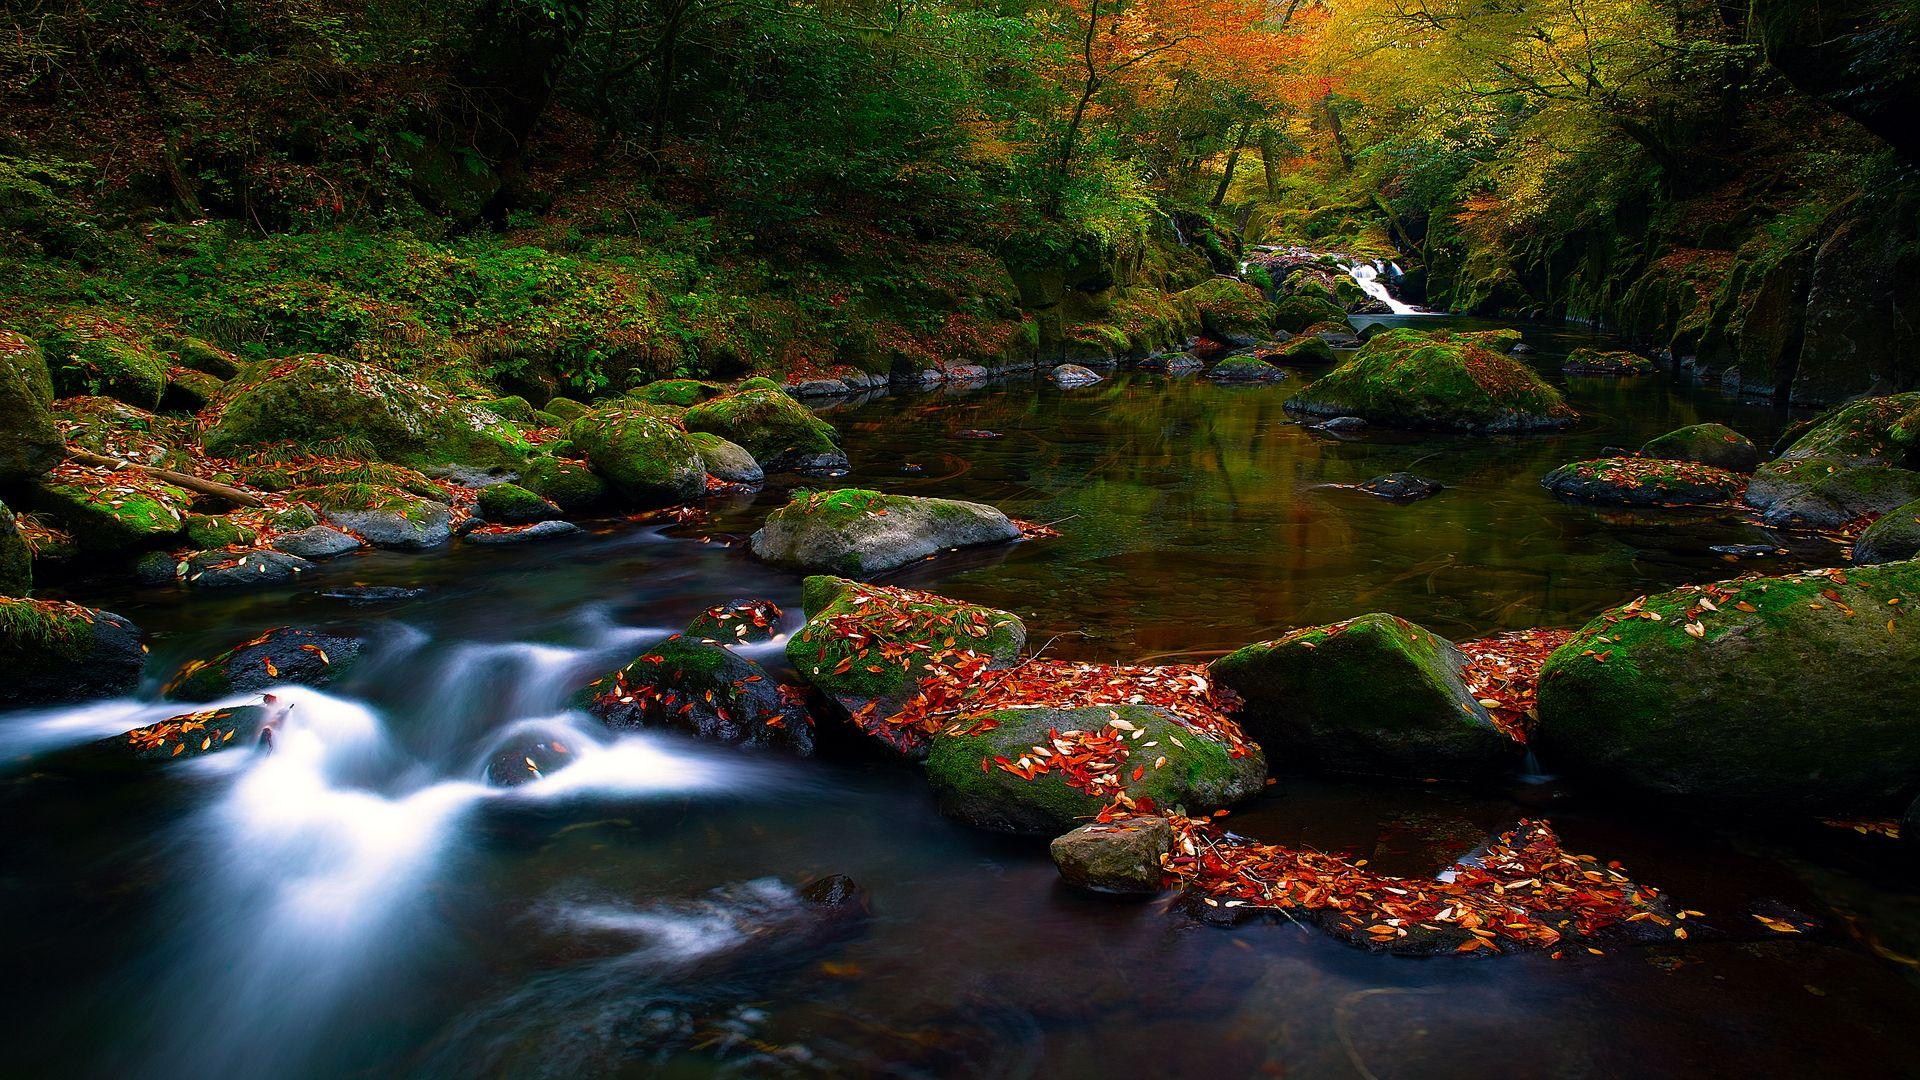 Autumn Leaves Nature Screensavers Beautiful Nature Autumn Nature